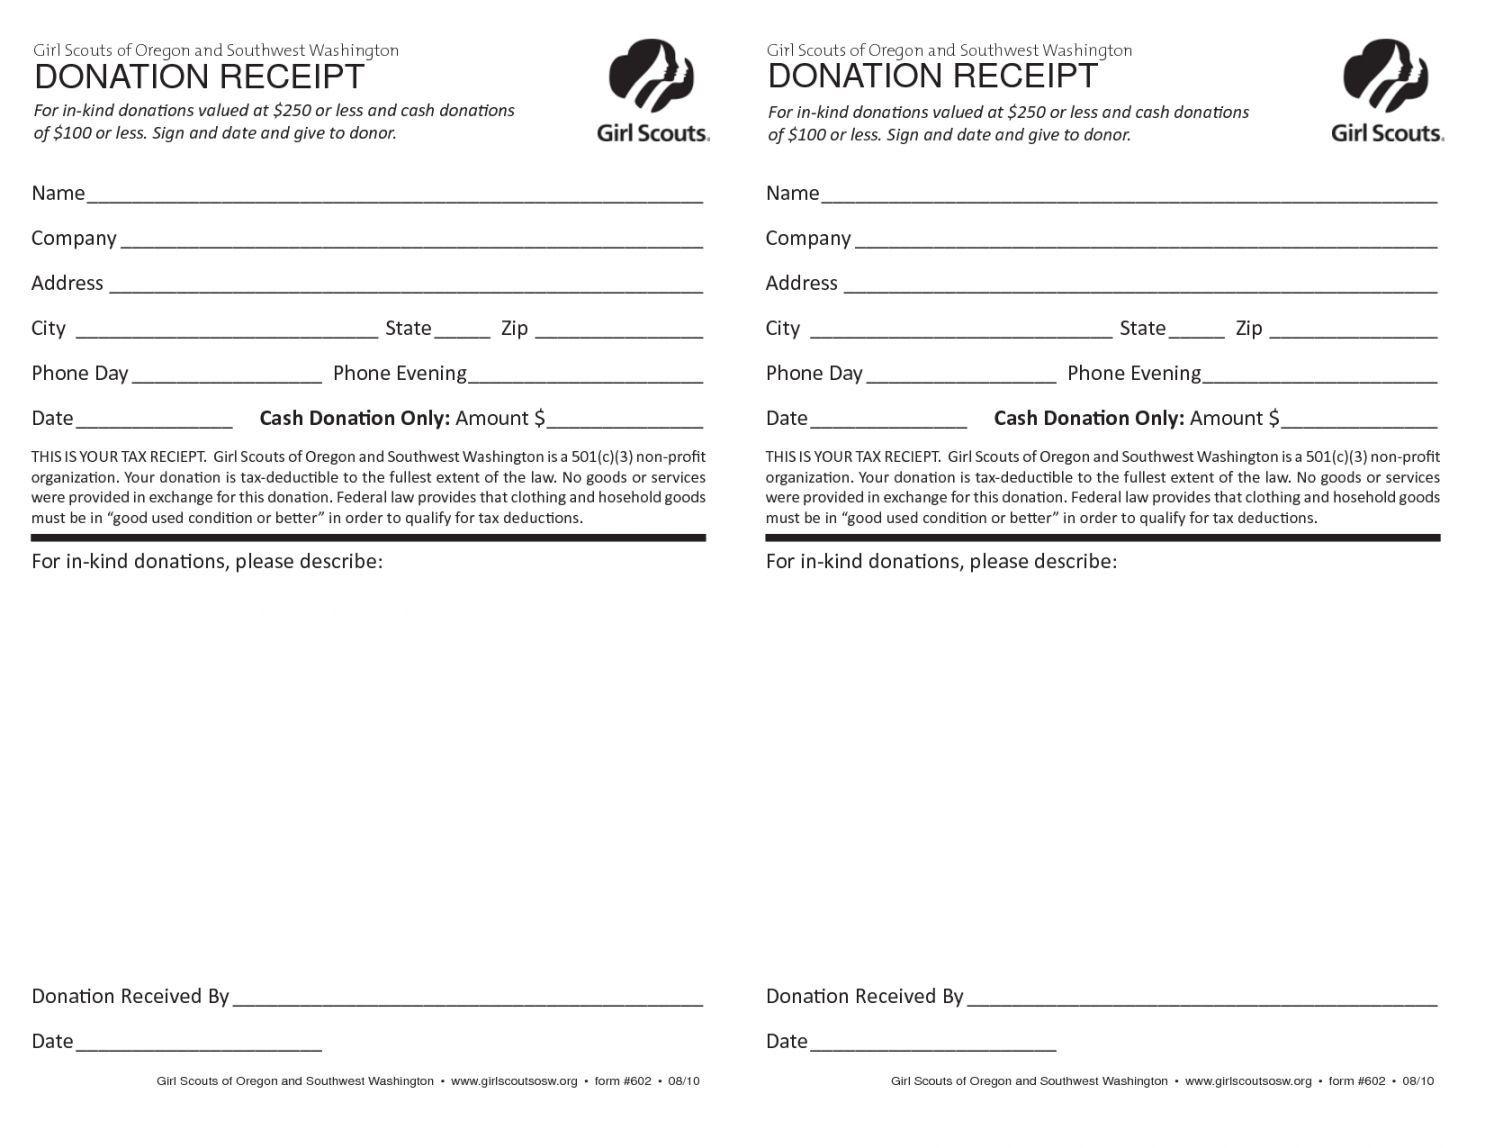 005 Wonderful Tax Deductible Donation Receipt Template Australia Image Full